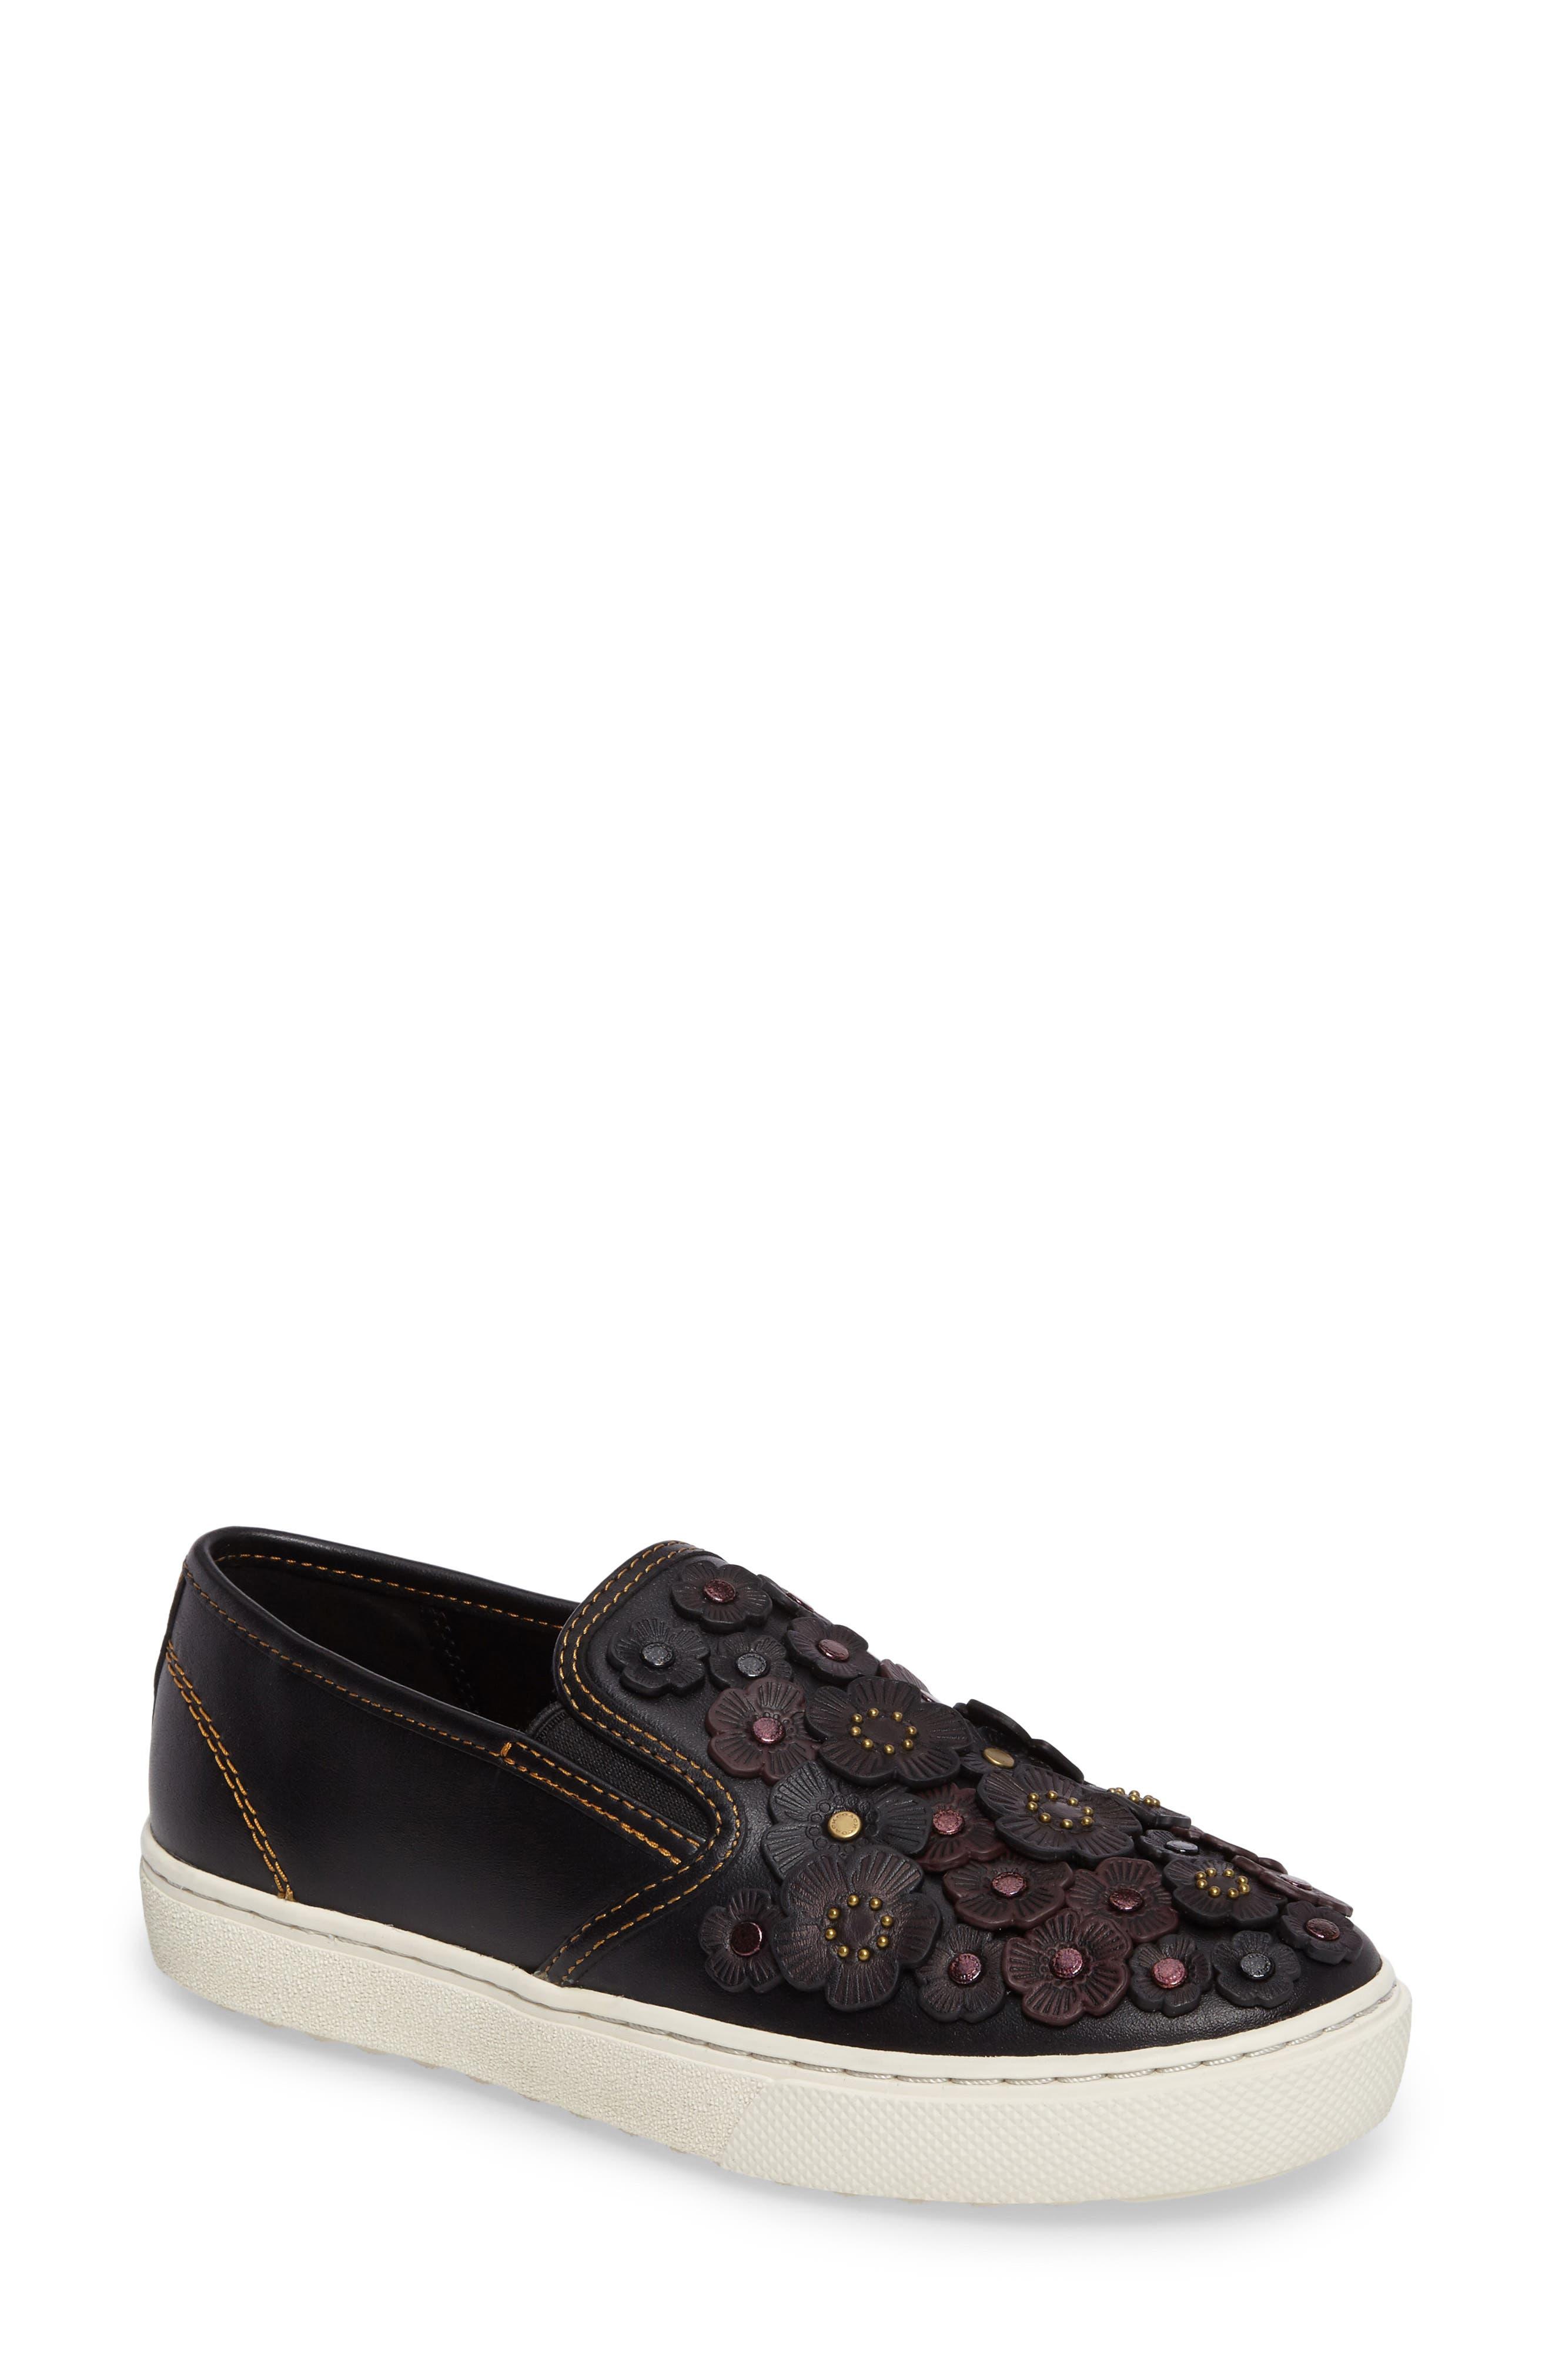 Tea Rose Slip-On Sneaker,                         Main,                         color, 001